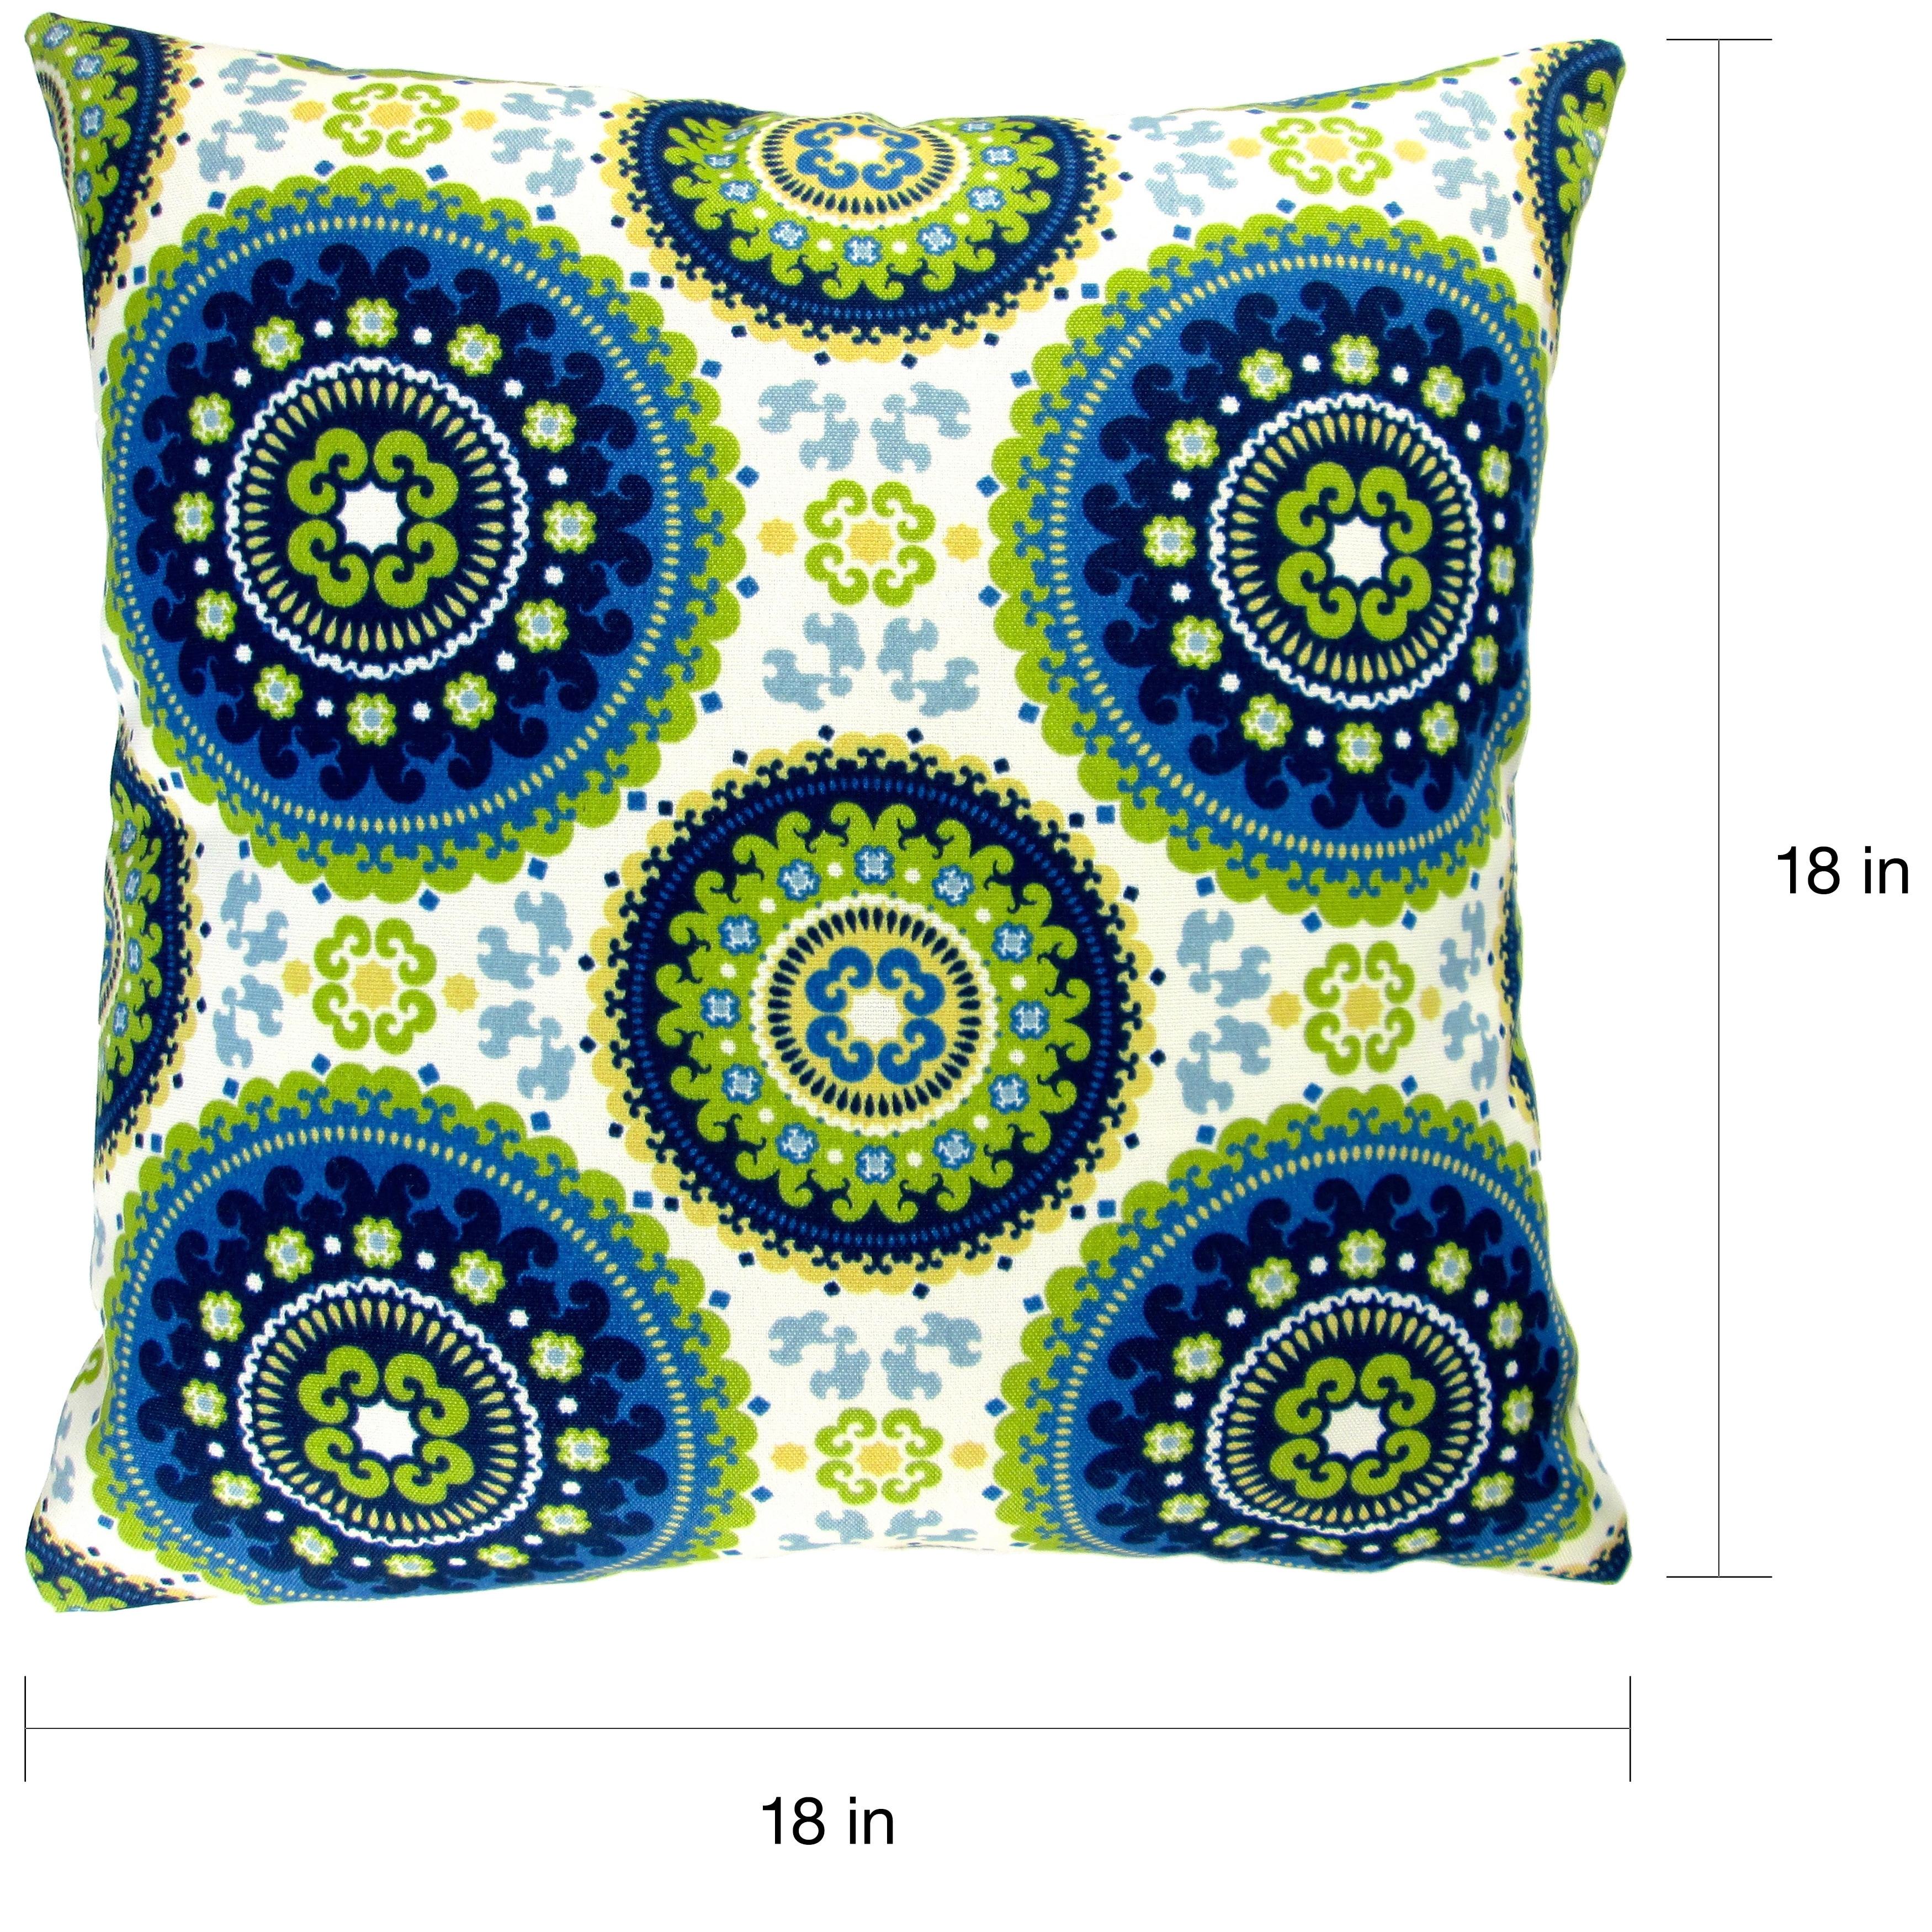 Artisan Pillows Indoor Outdoor 18 Inch Modern Contemporary Geometric Circles Blue Lime Green Yellow Throw Pillow Set Of 2 Overstock 10219693